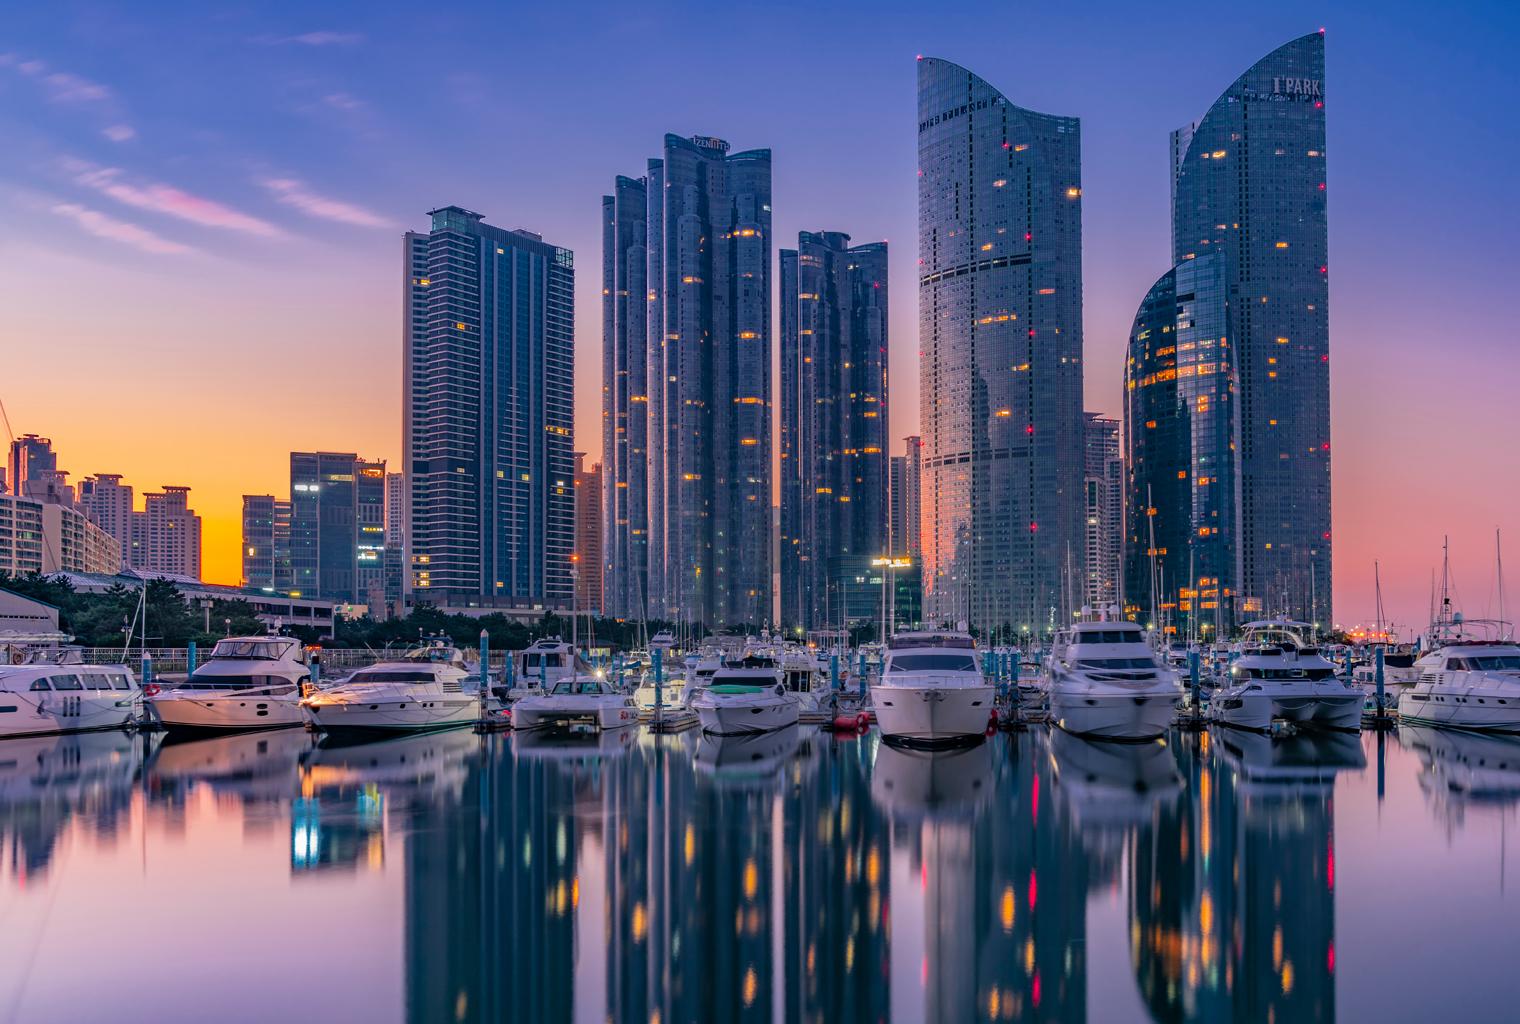 Bithumb Pledges $8M to South Korea's 'Regulation Free' Blockchain Zone